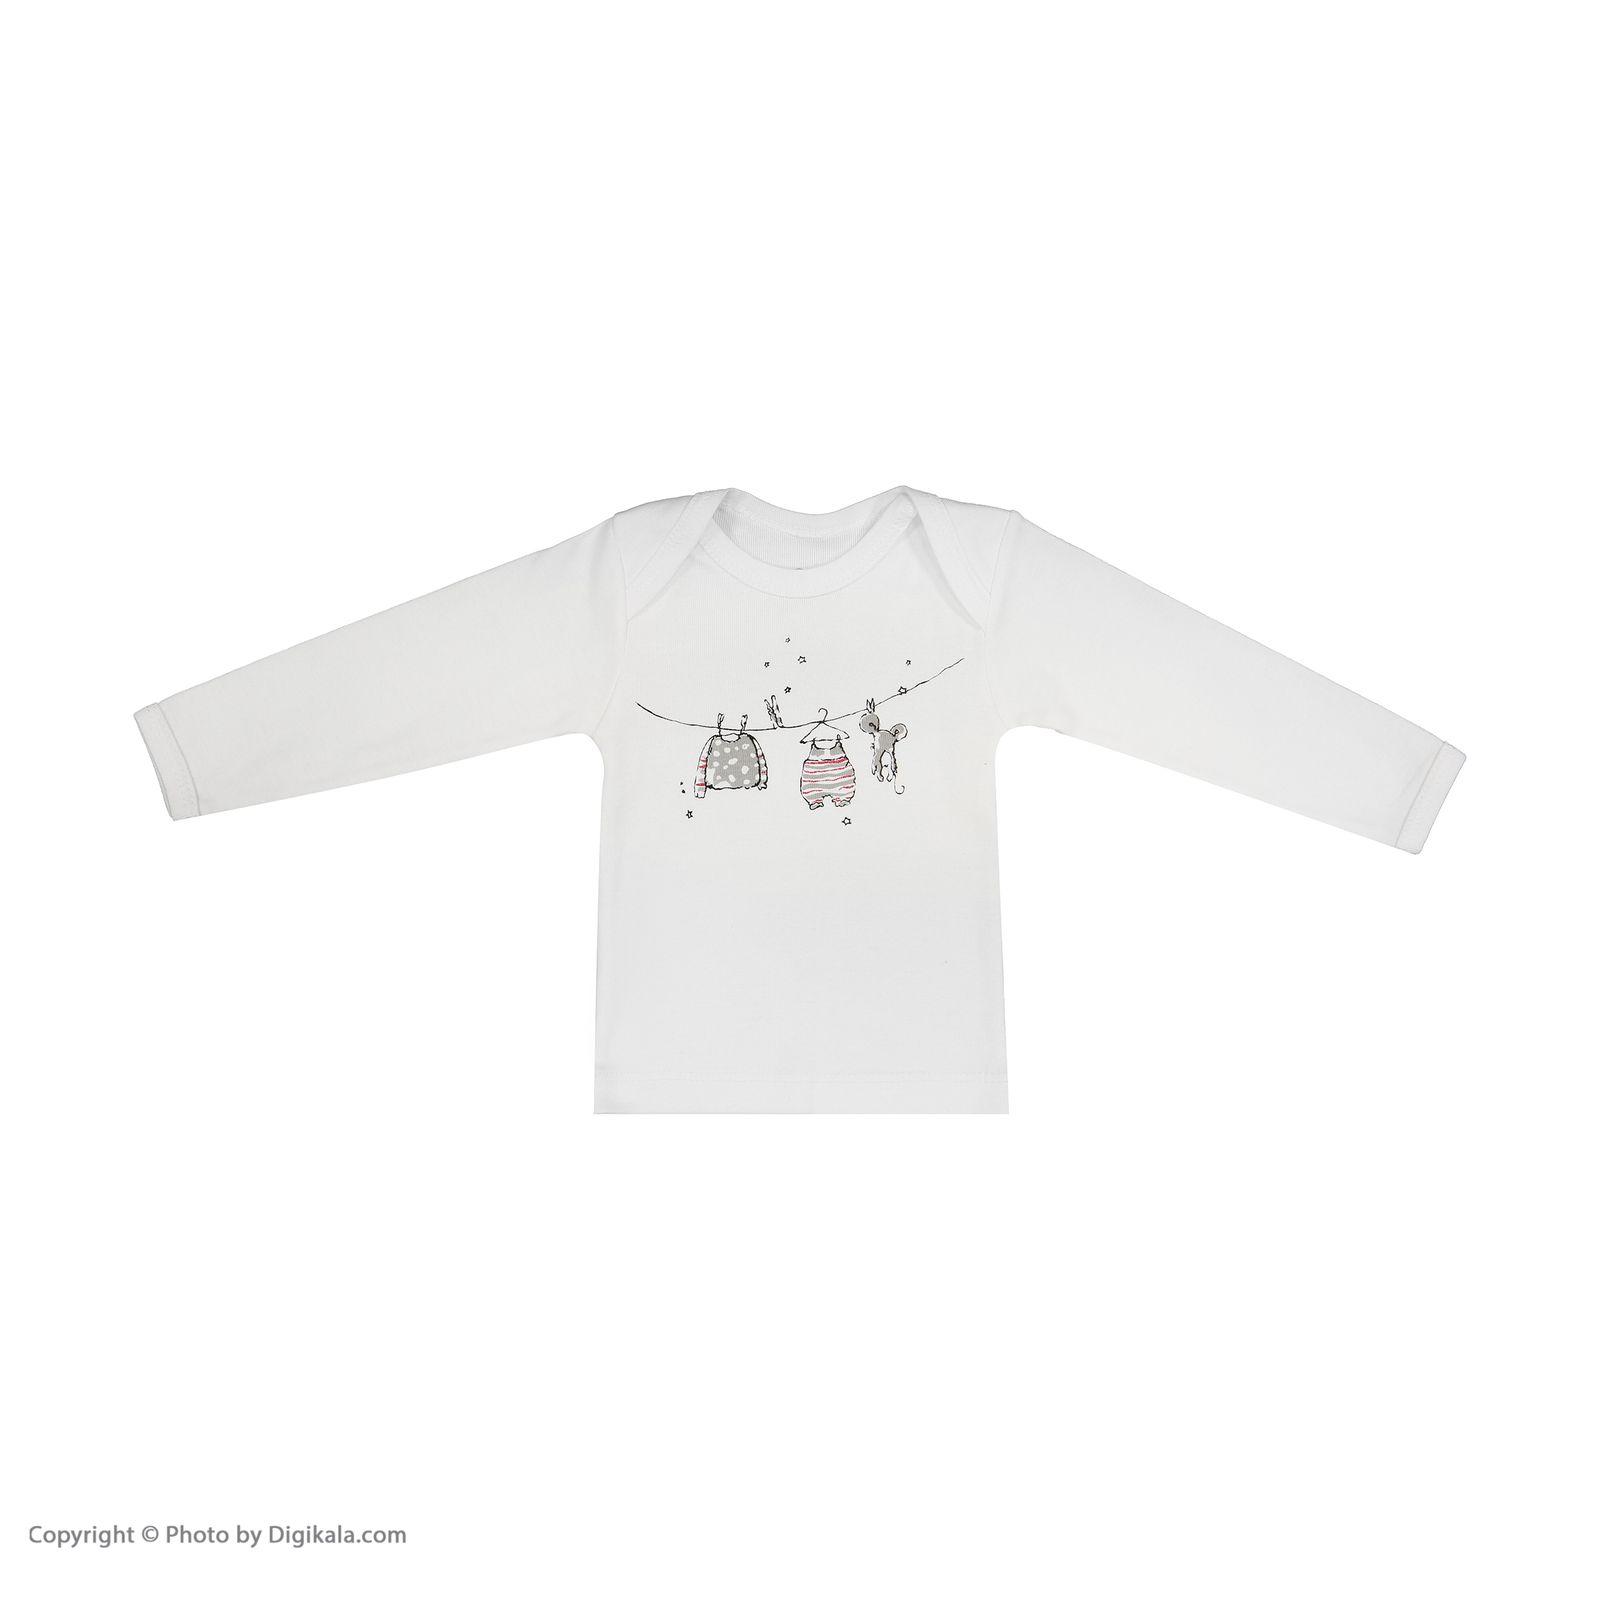 تی شرت نوزادی سون پون مدل 1391213-01 main 1 1